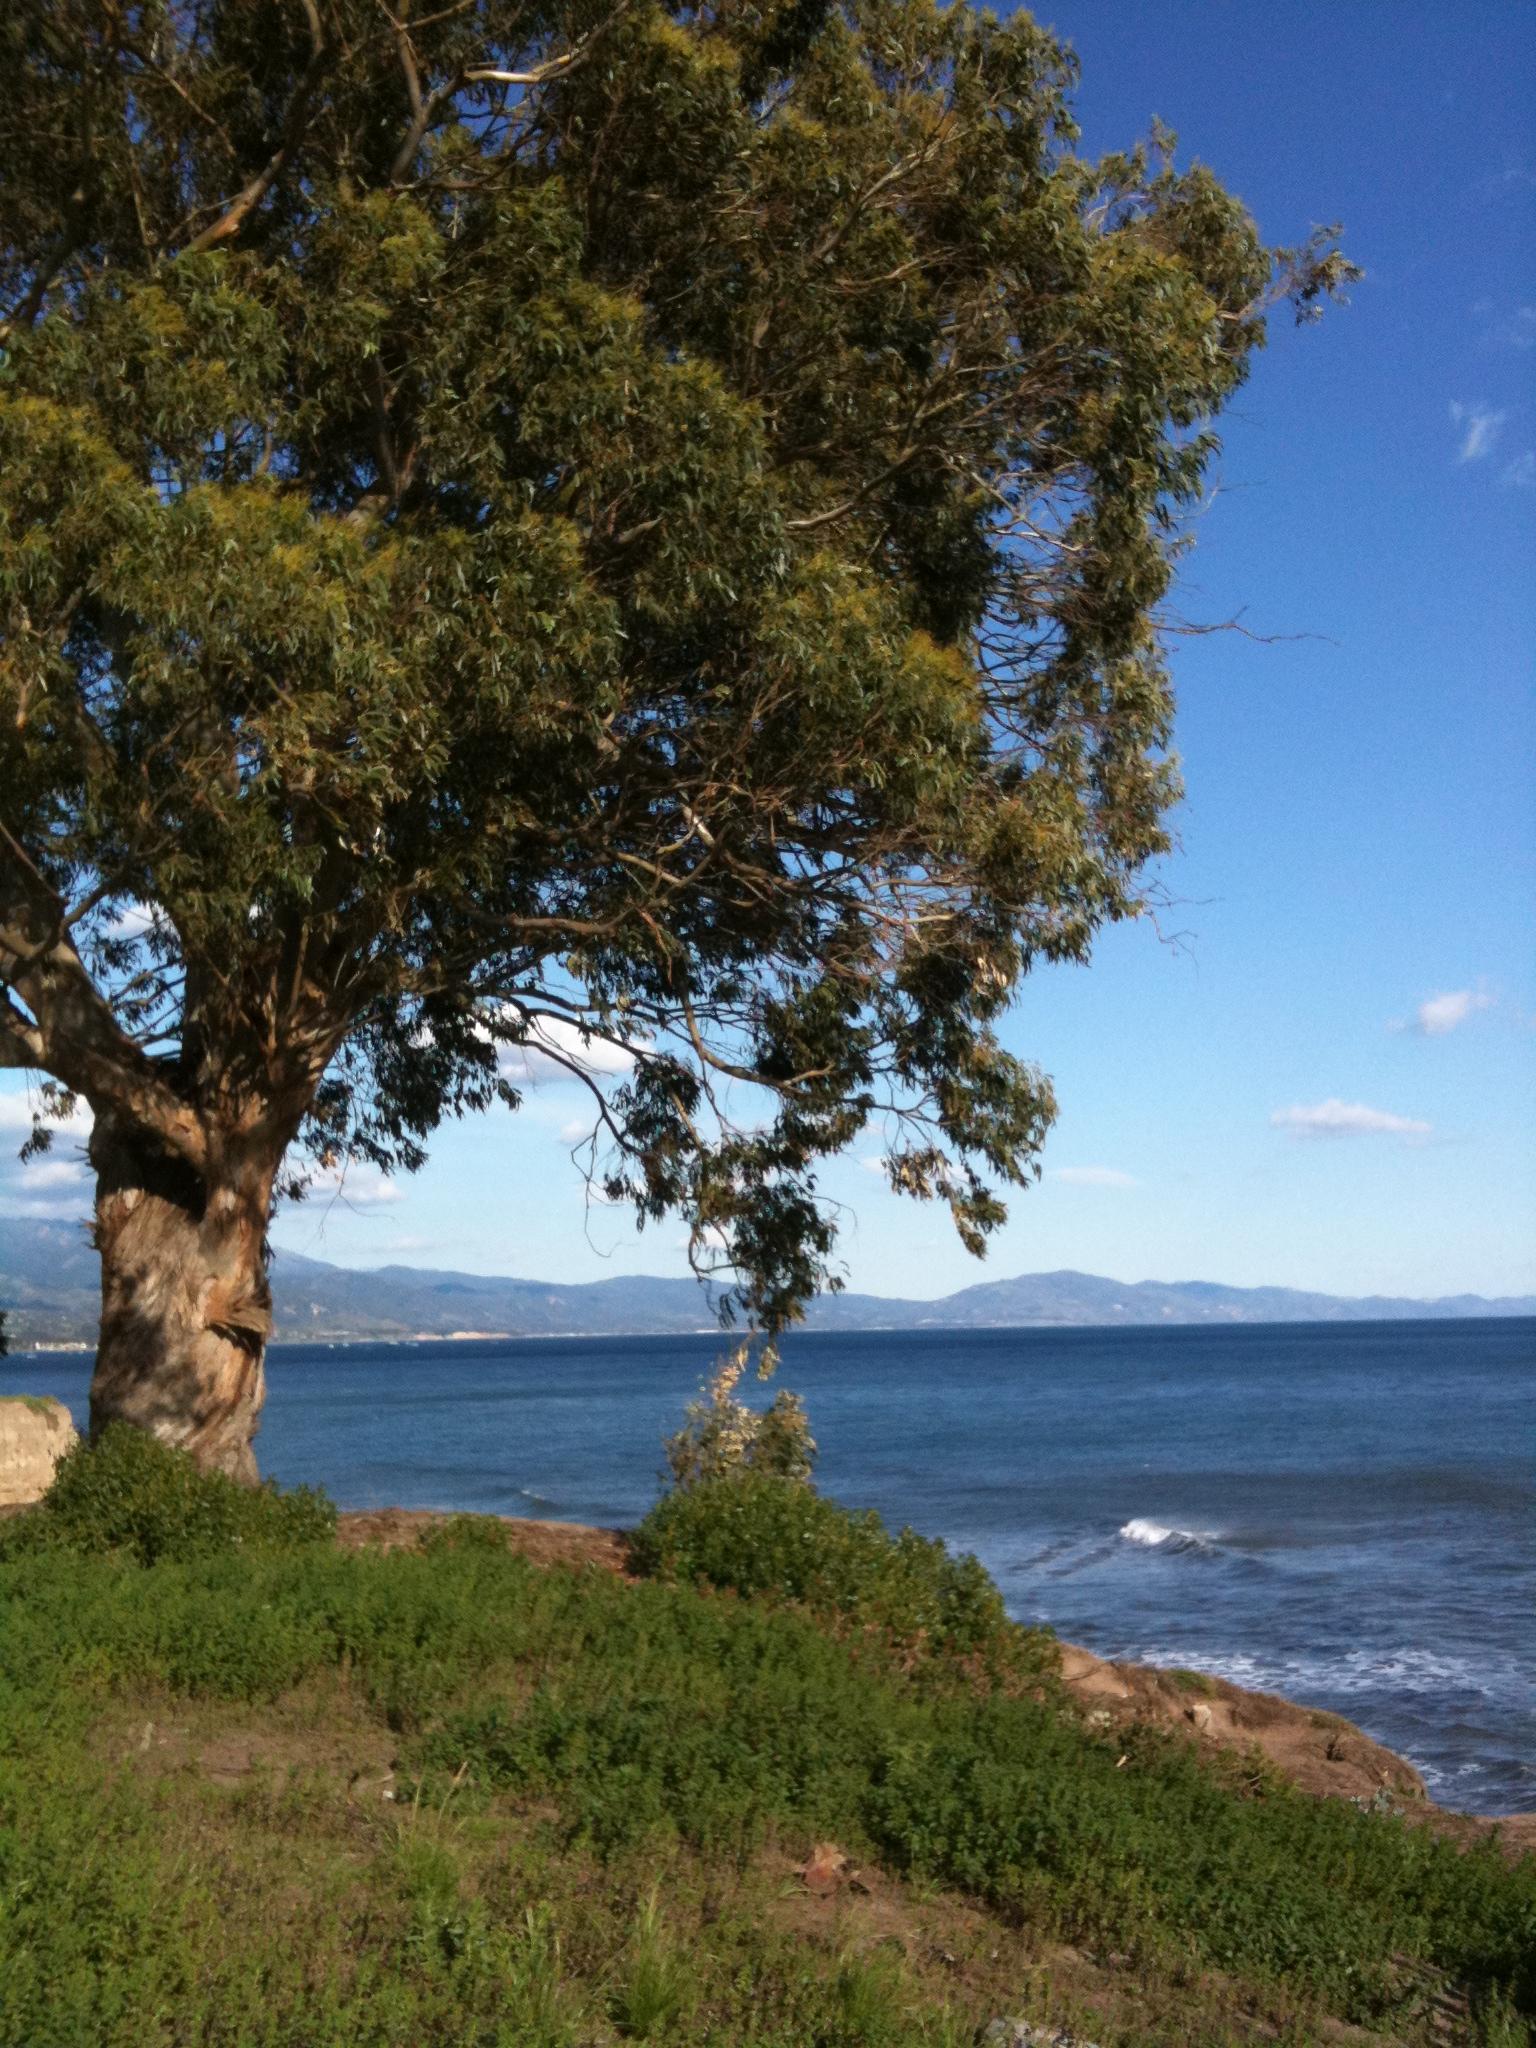 Staycation - Santa Barbara